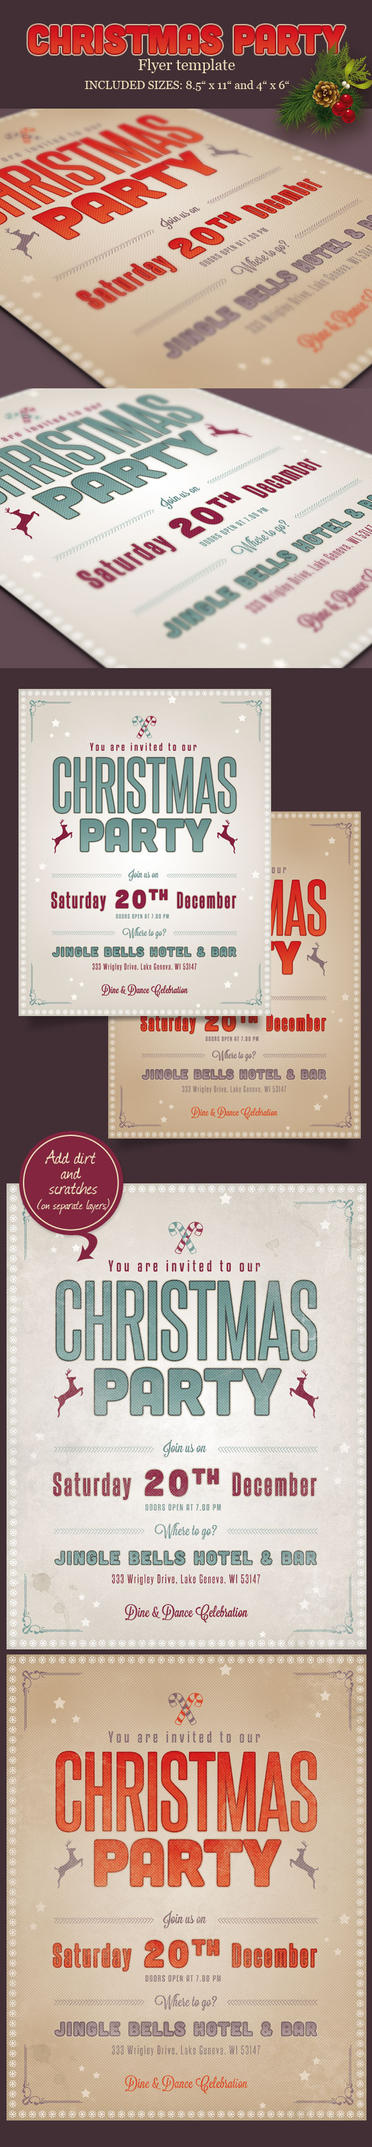 Retro Christmas Flyer / Invitation by imagearea